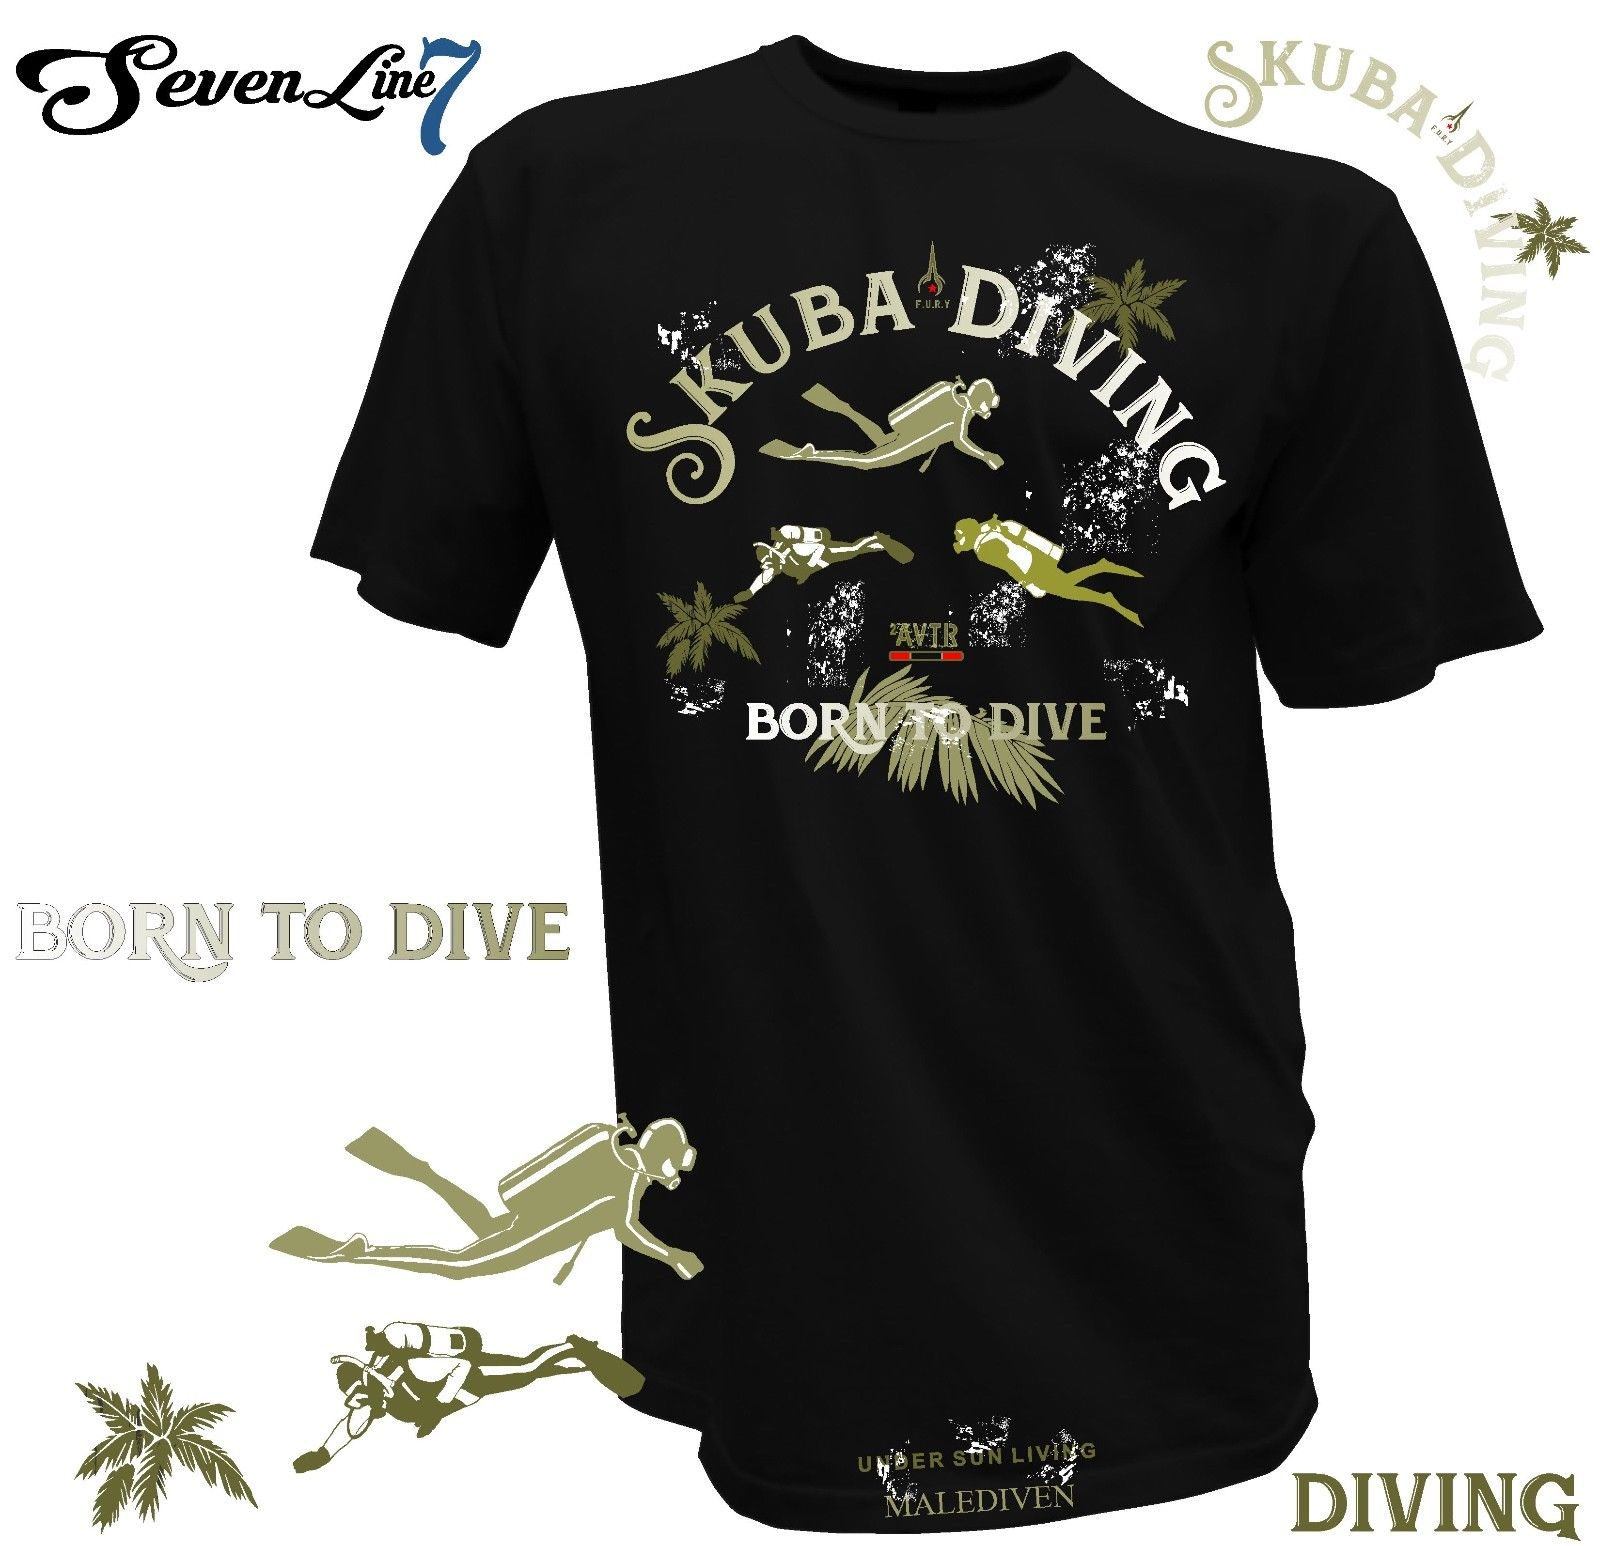 2019 neue Cool Tee Shirt T-Shirt Taucher Wassersport Skuba Div